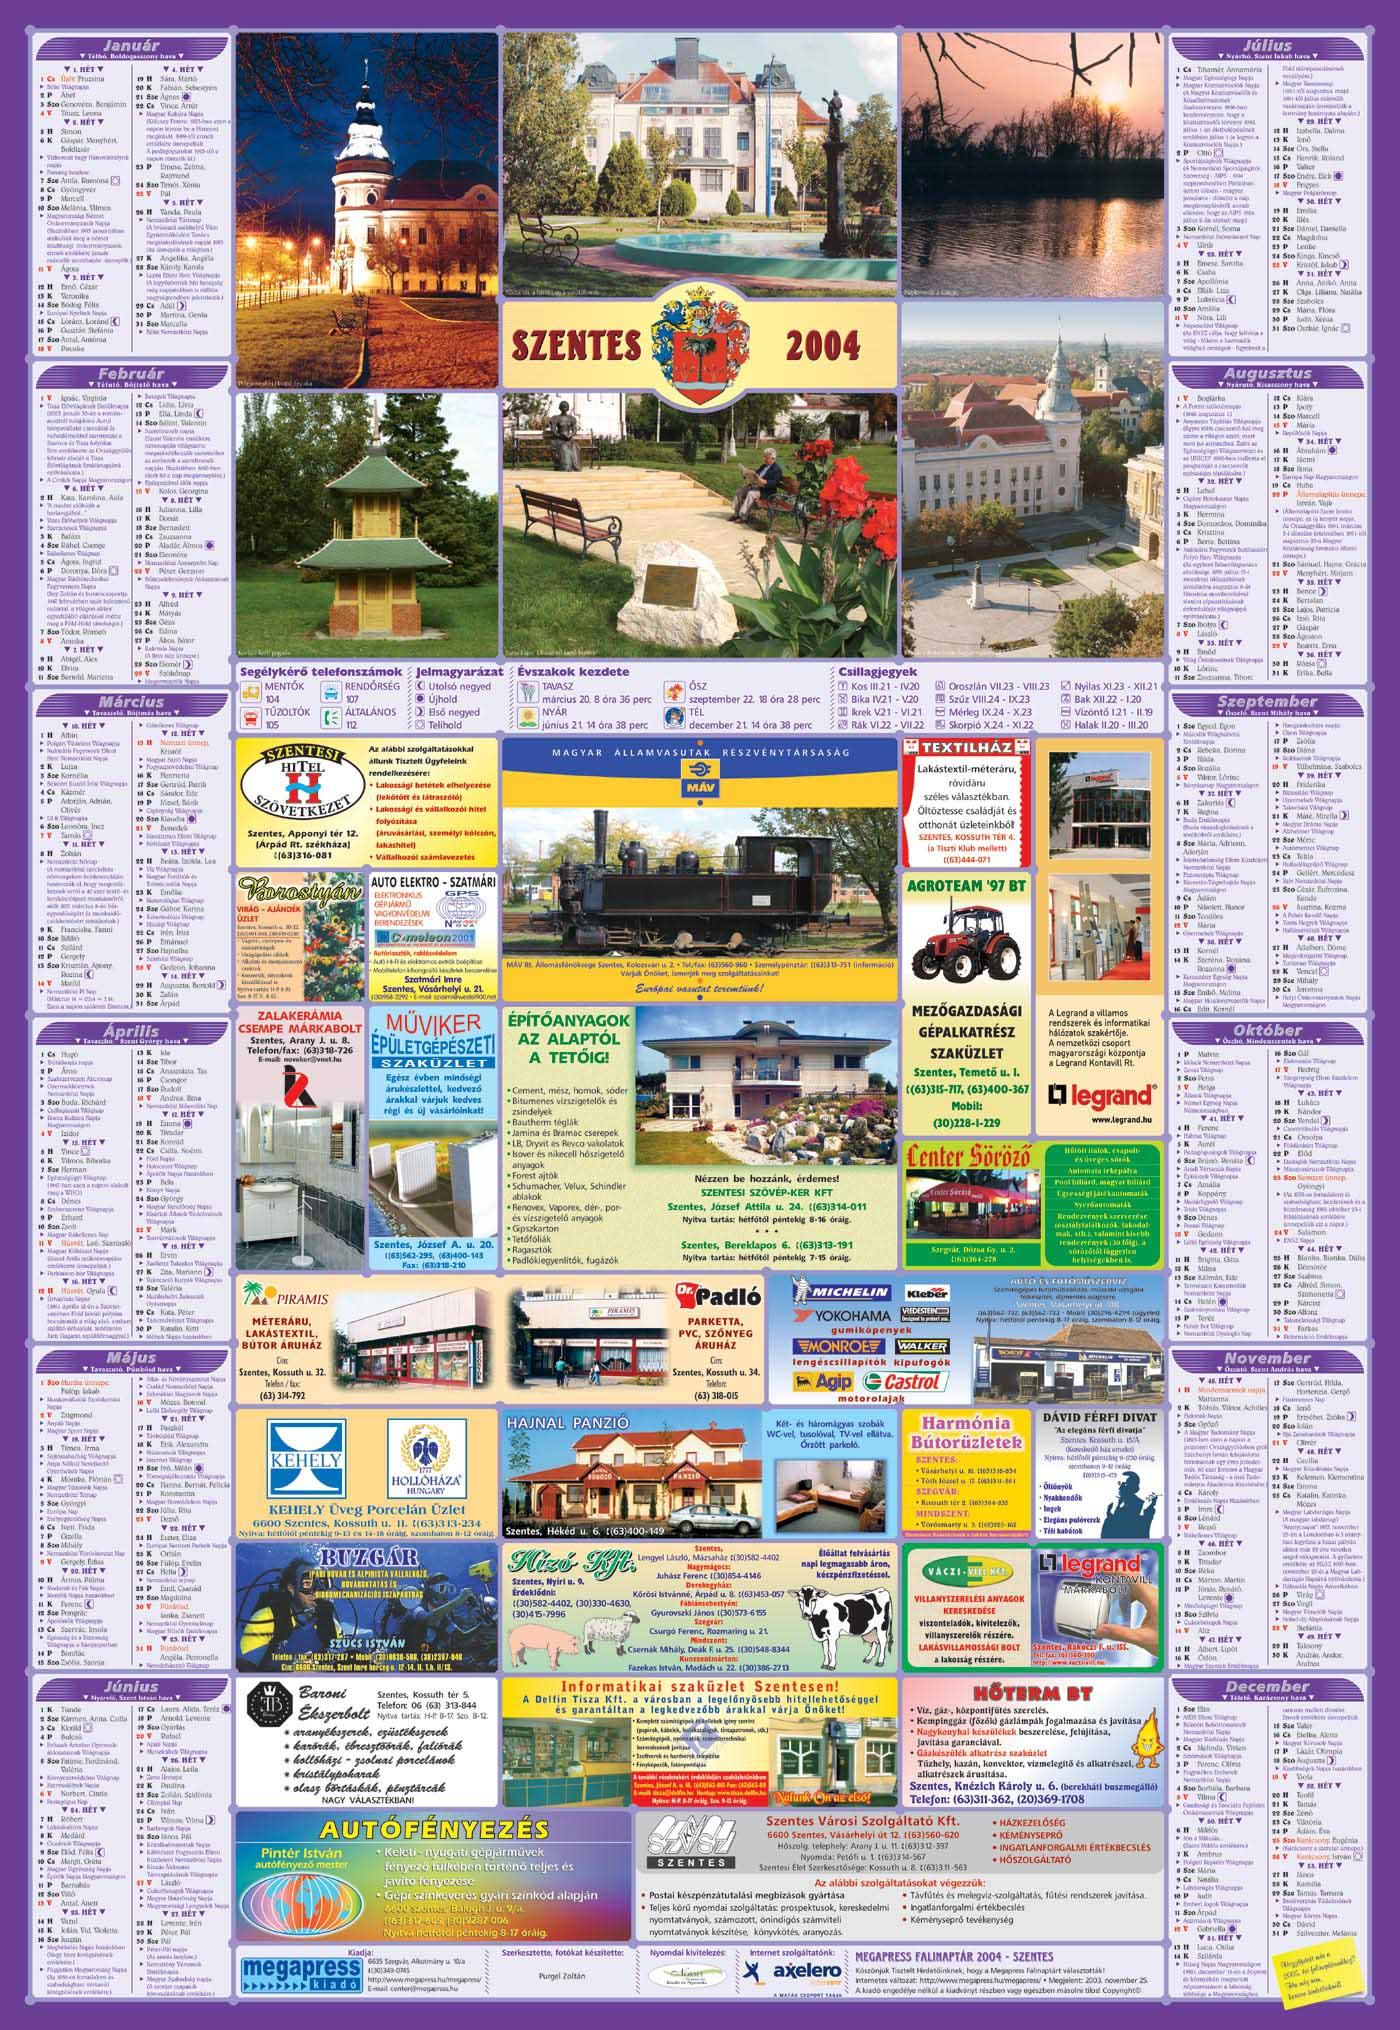 23-Szentes2004Falinaptar-2003